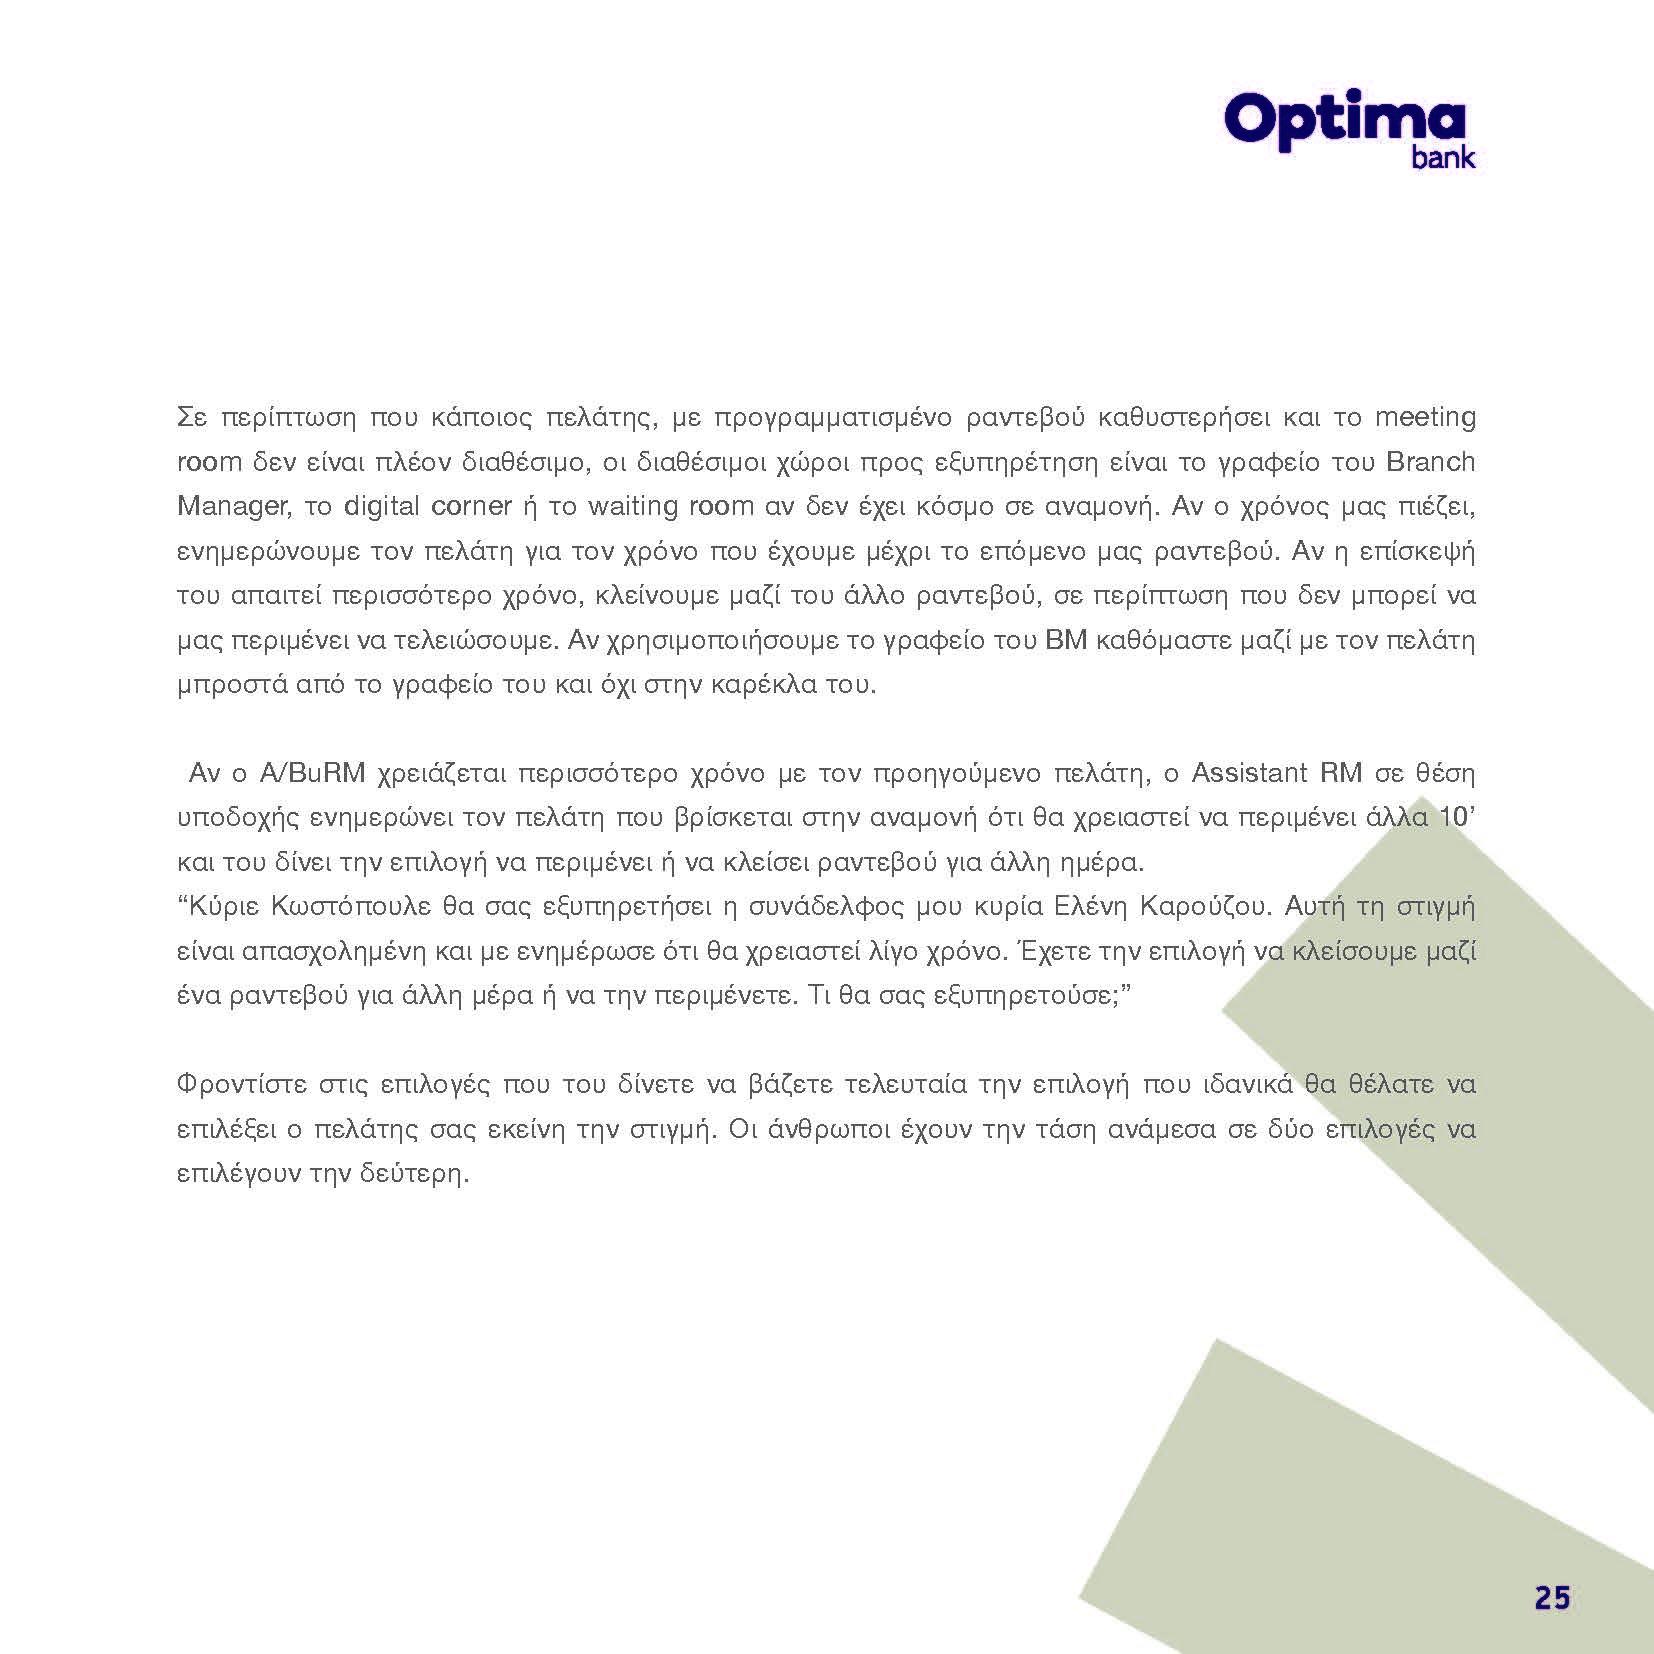 https://www.jib.gr/wp-content/uploads/2020/09/OPTIMA-BANK-BOOKLET-WEB_Page_025.jpg